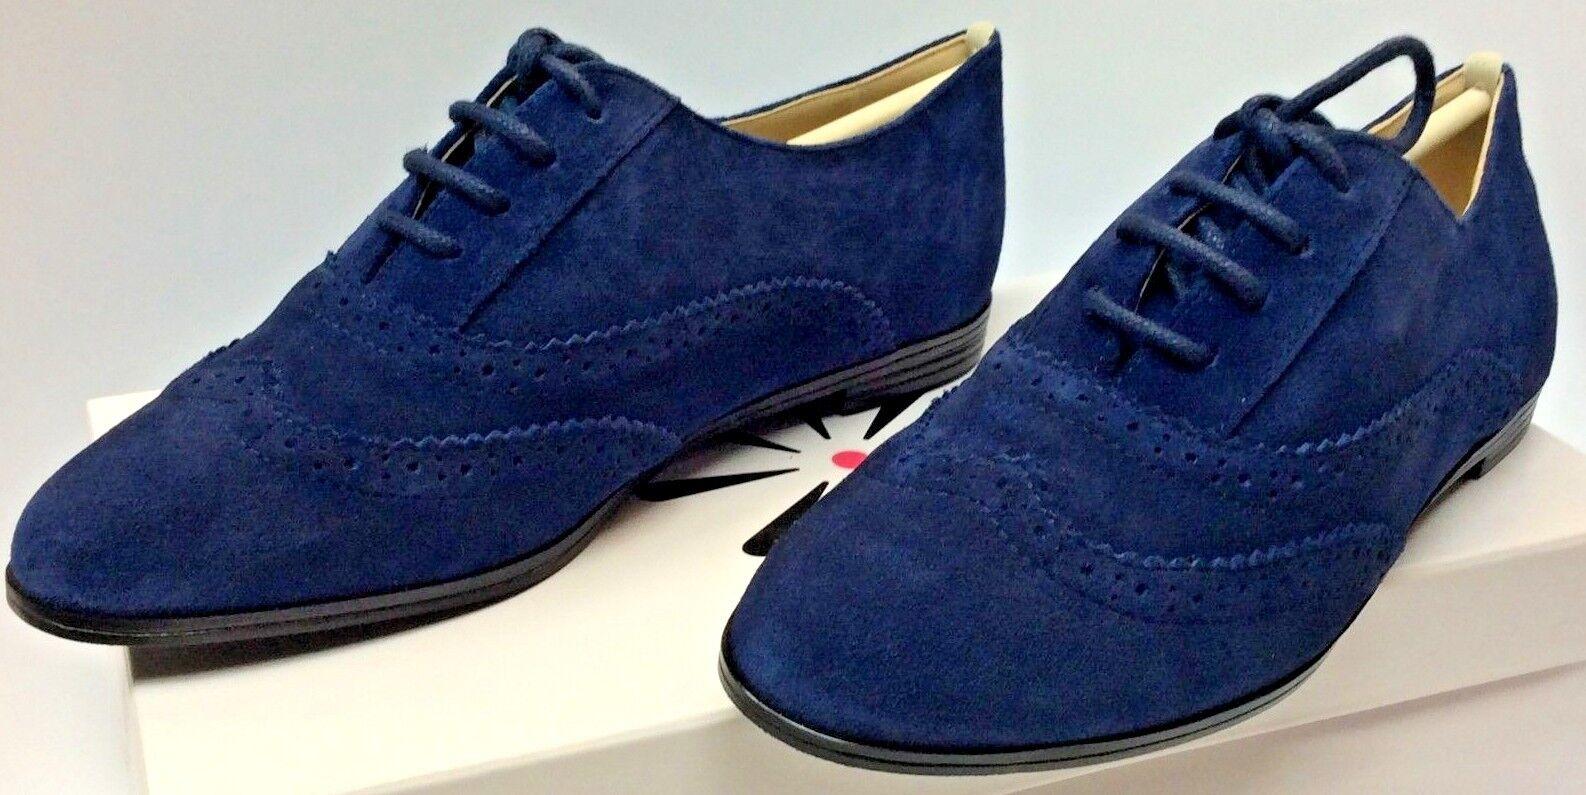 Isaac Mizrahi 'Fiona' Dark bluee Suede Pinhole Lace Up Wingtip Oxford Flats 6W